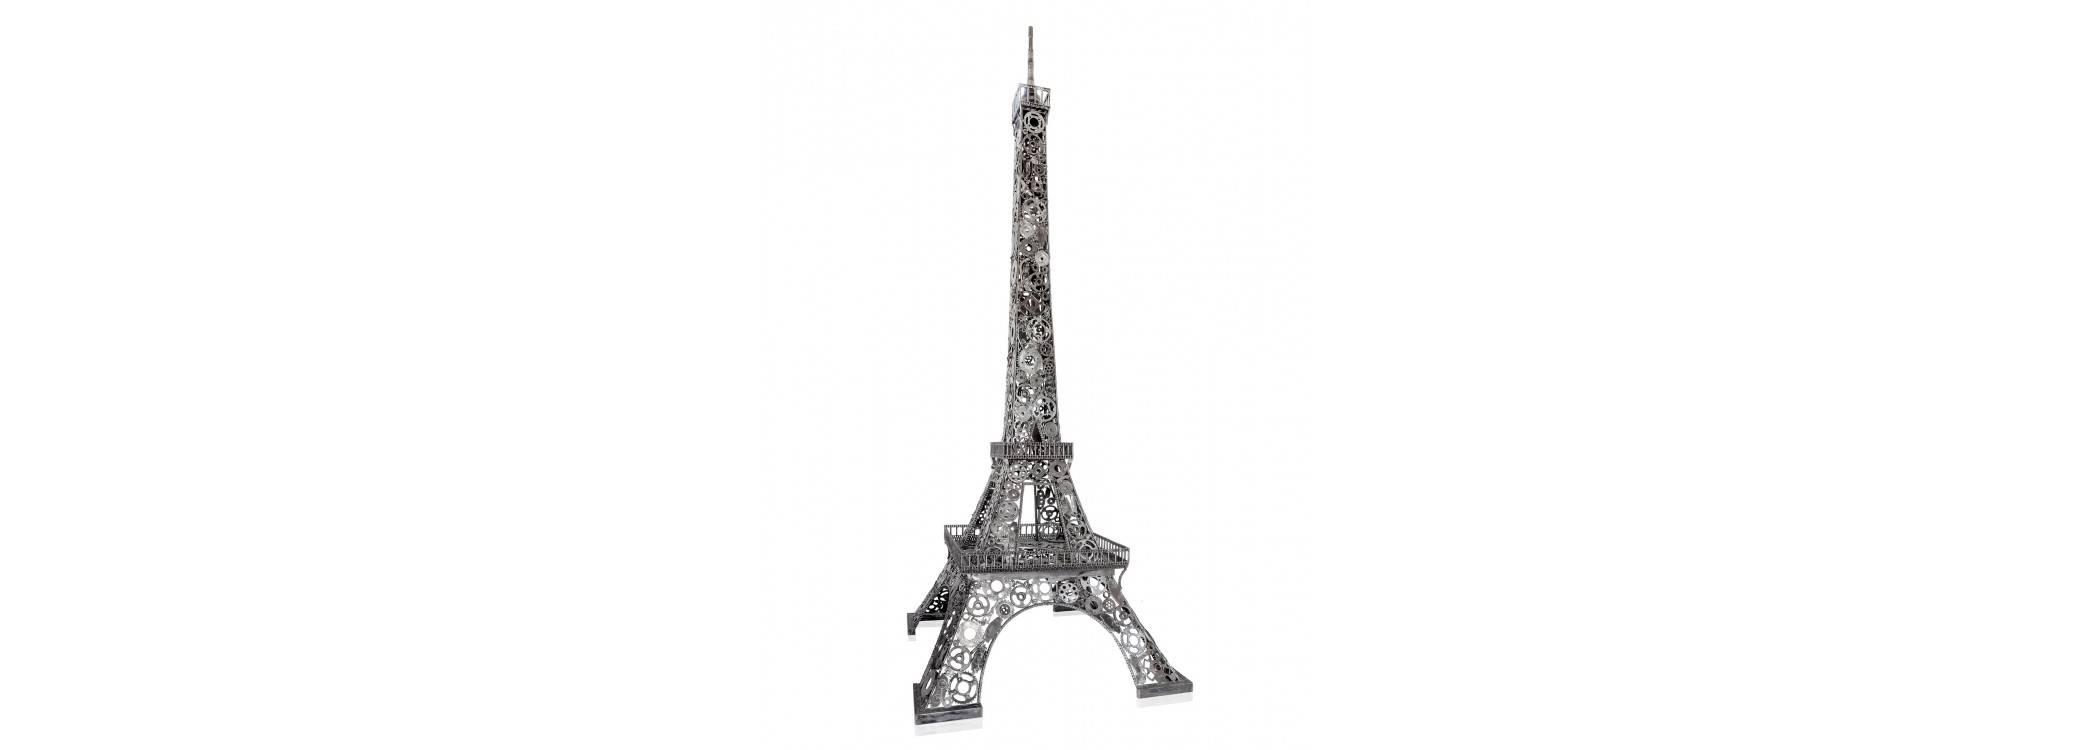 Metal sculpture in motorbike parts : Eiffel Tower